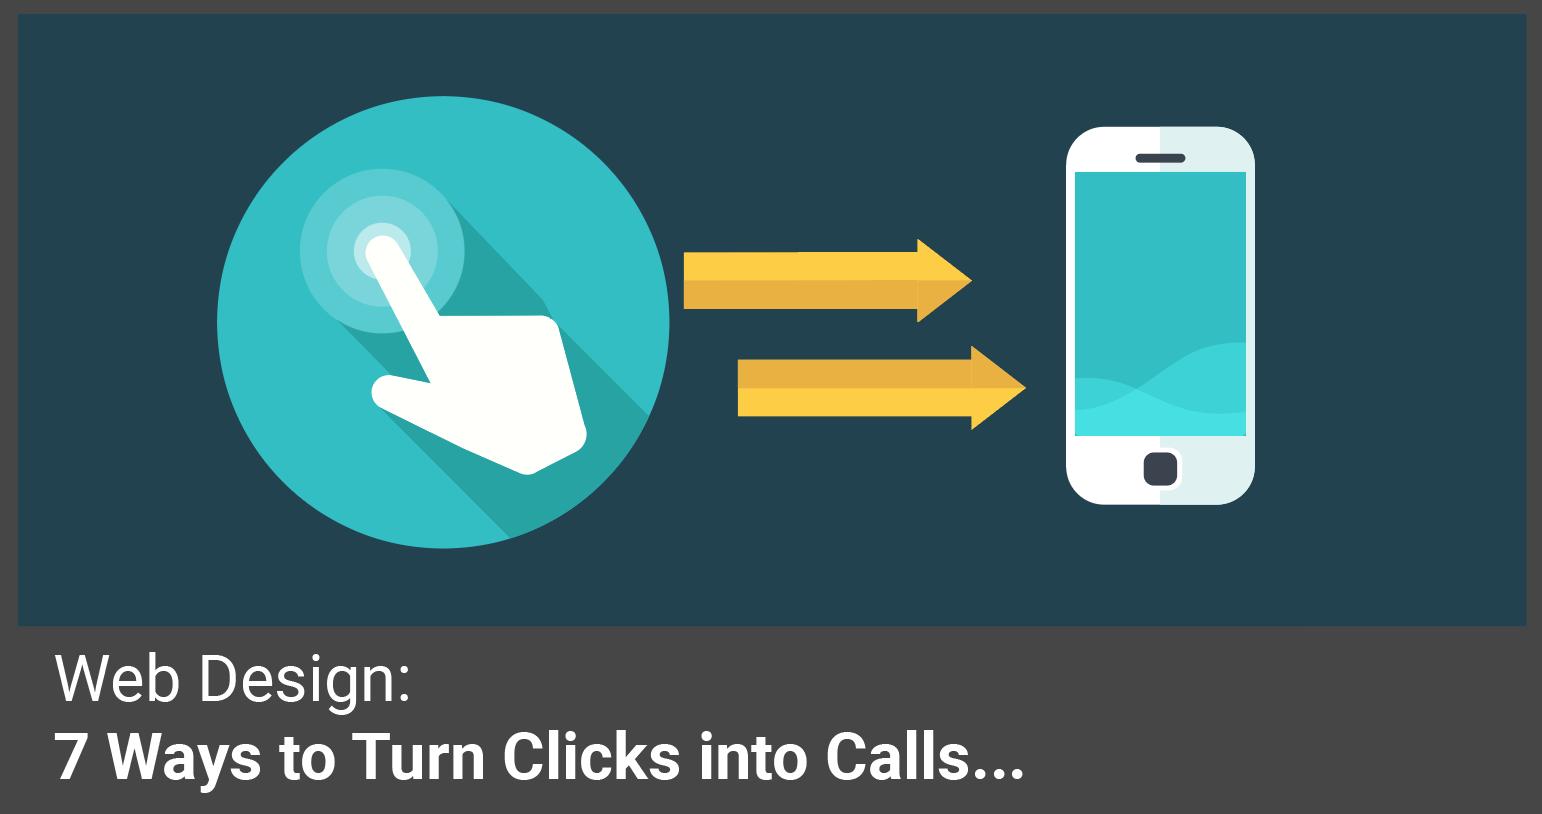 Ways to turn clicks into calls